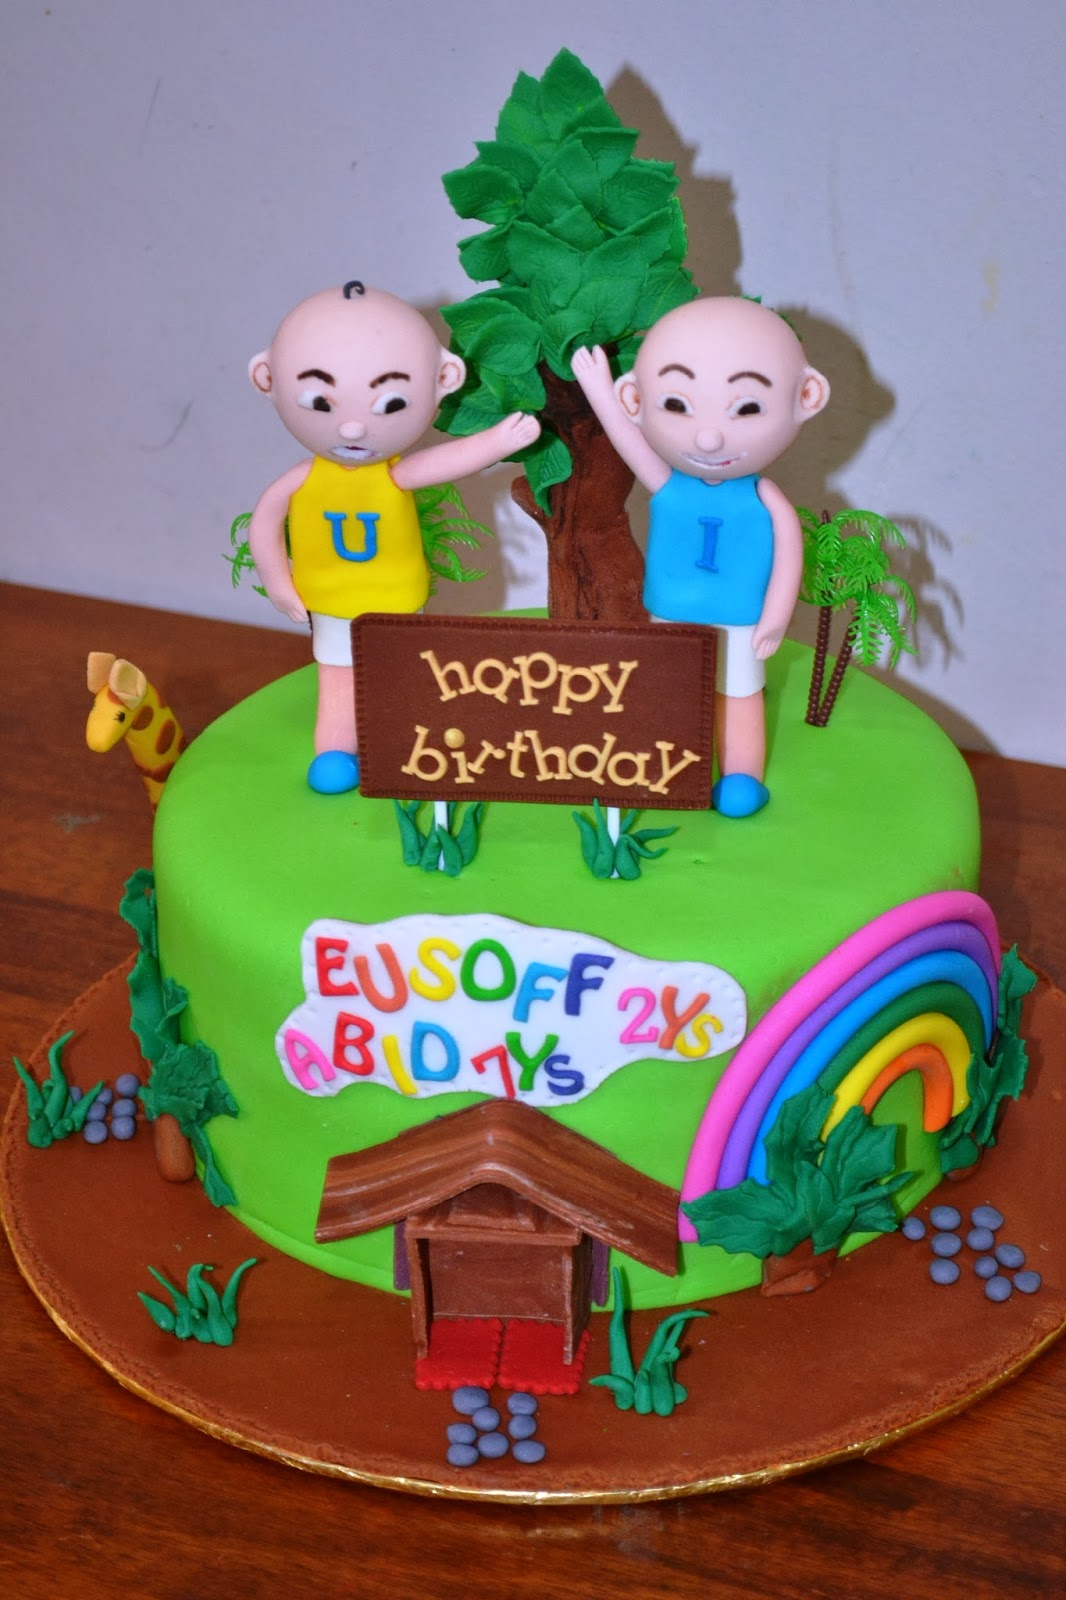 MyPu3 Cake House Upin Ipin Cake